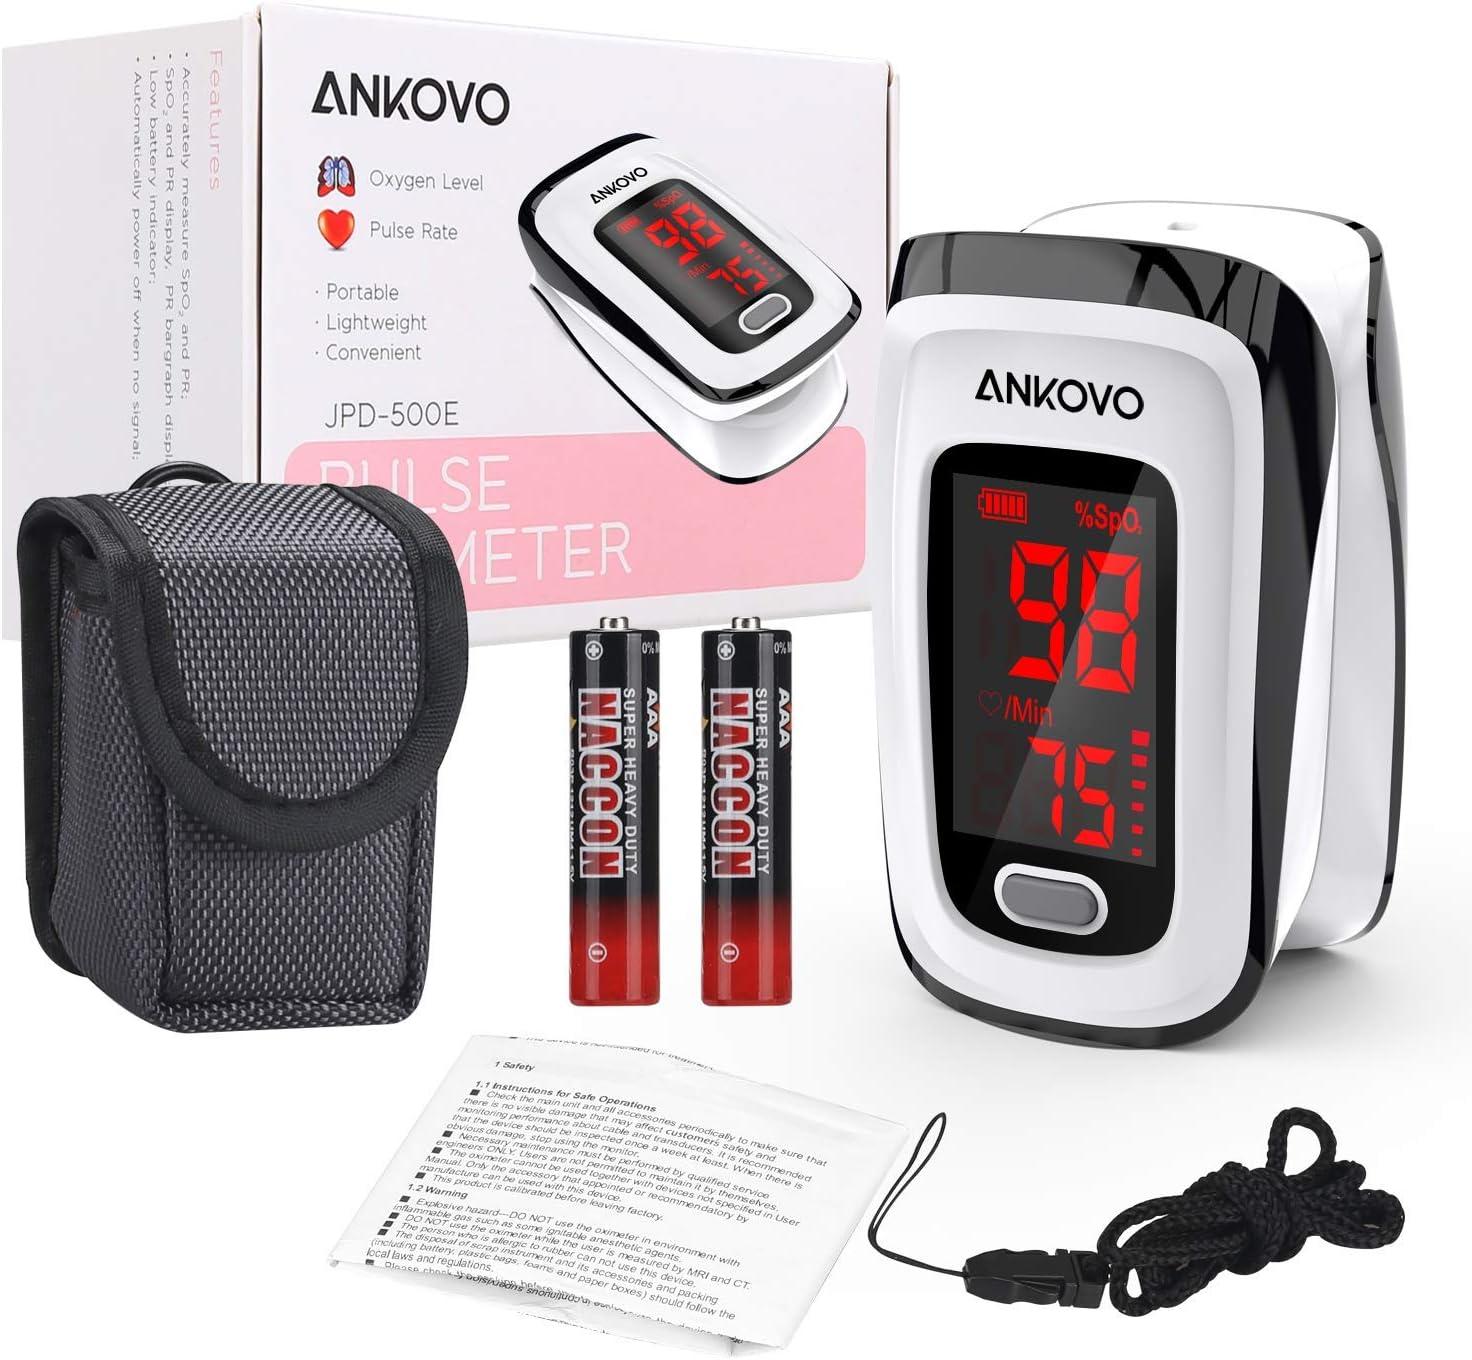 Ankovo Pulse Oximeter, Oxygen Saturation Meter for the Finger